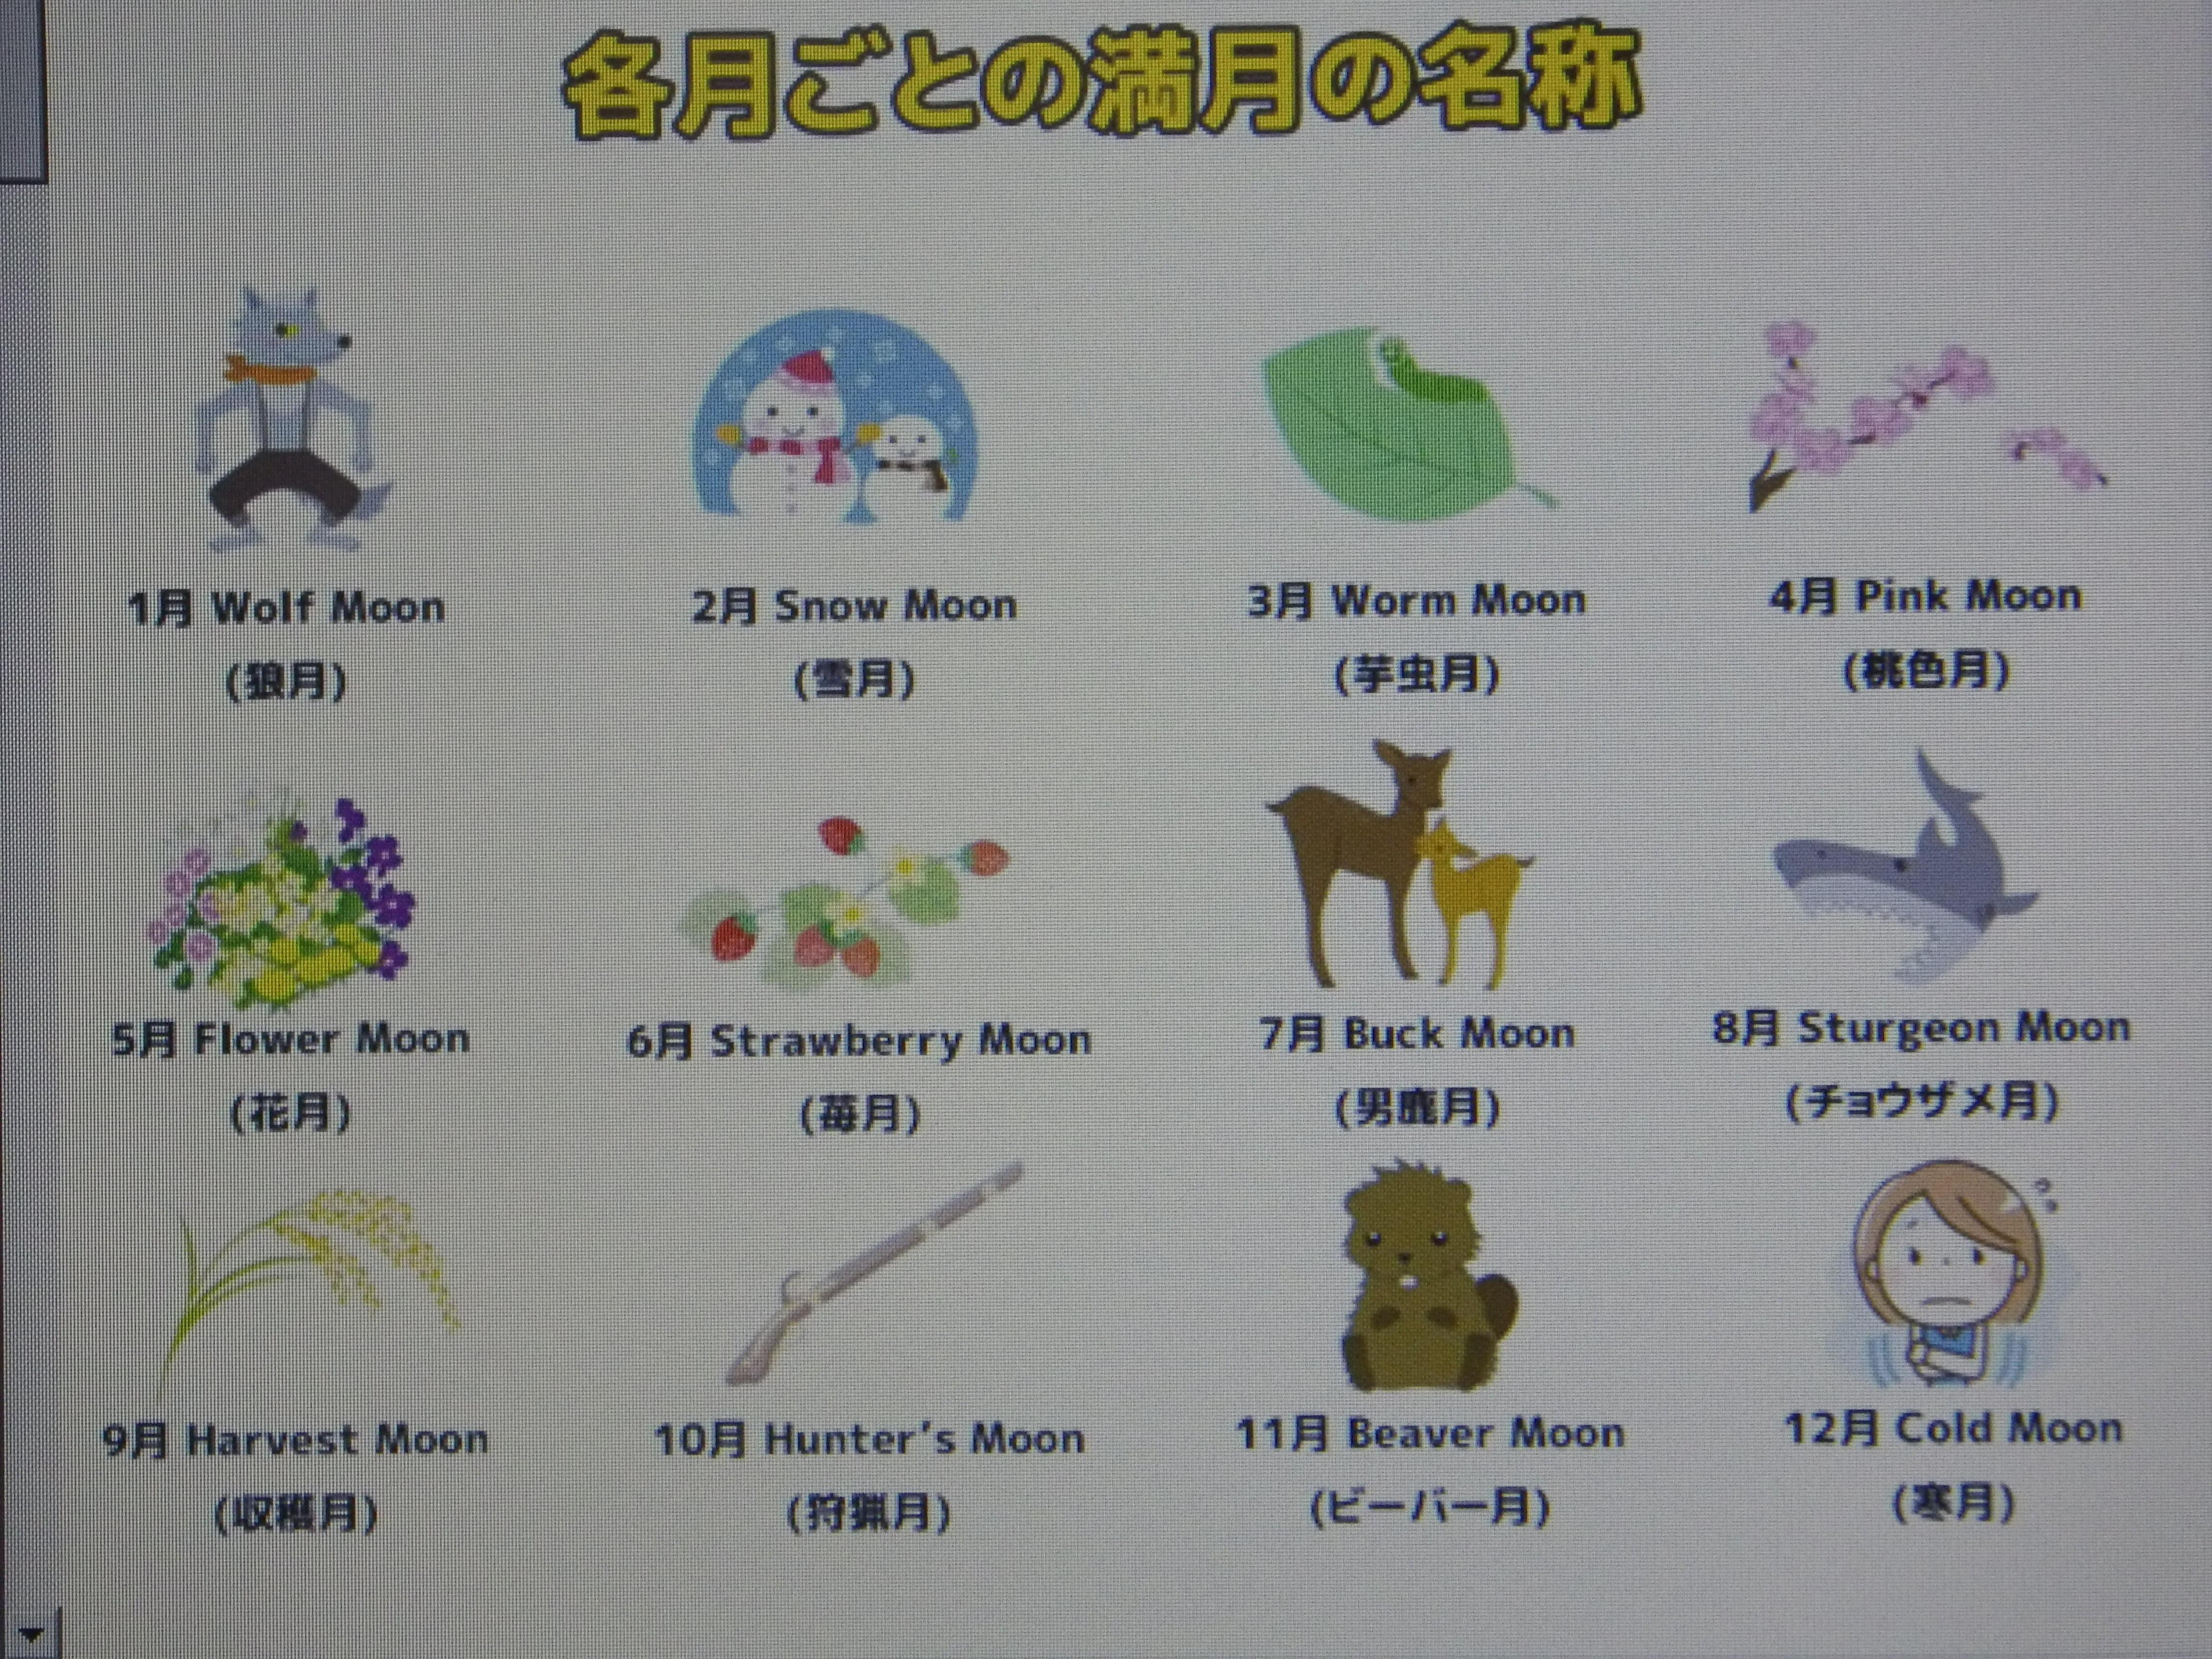 https://www.lixil-reformshop.jp/shop/SP00000505/photos/IMGP3304.JPG